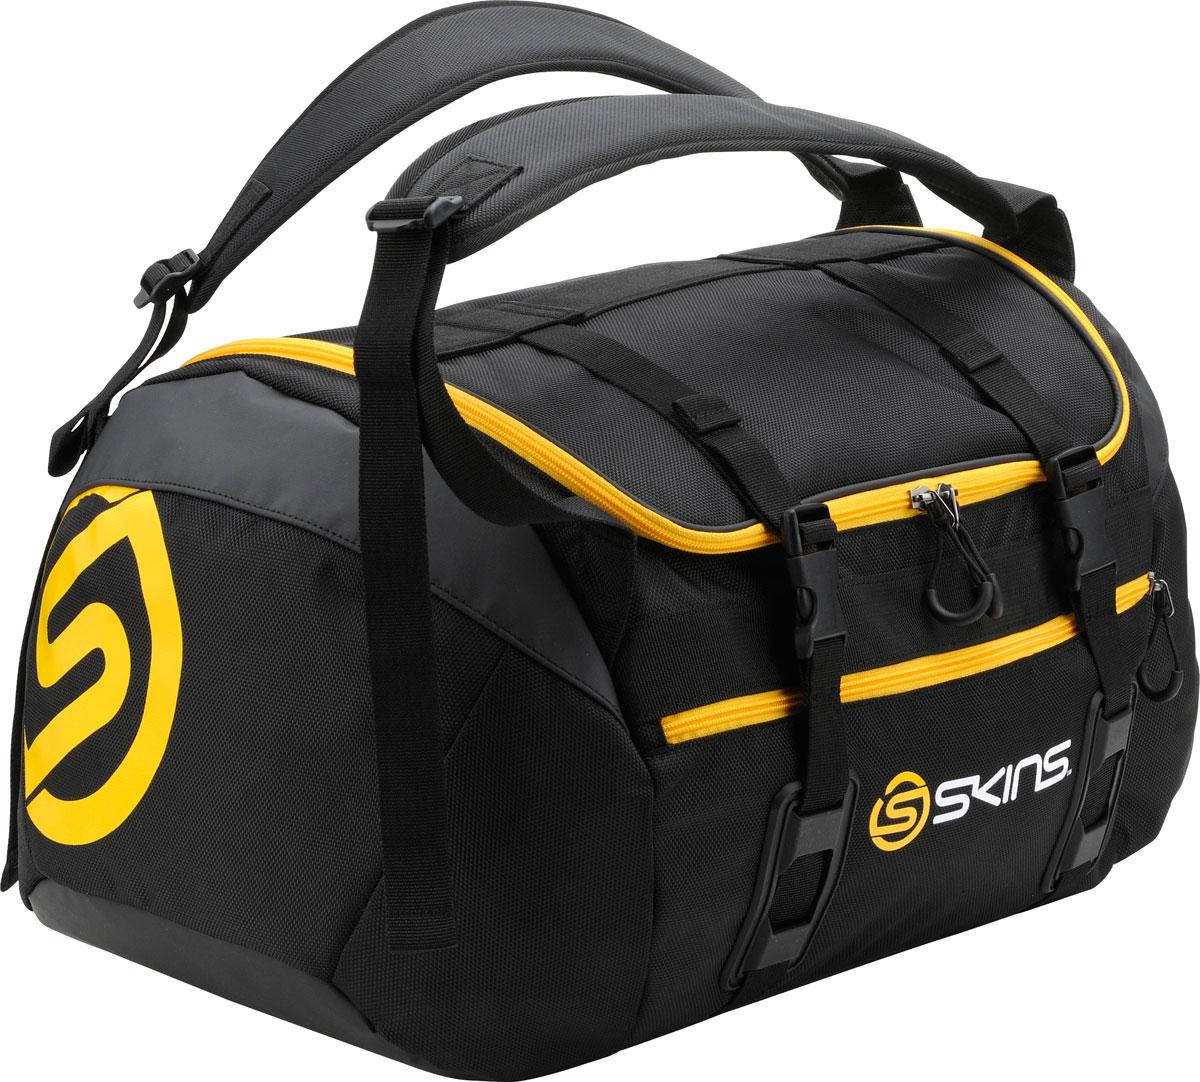 SKINS(スキンズ) SRY7702 2WAY ボストンバッグ リュック ショルダーバッグ 容量45L BKYL